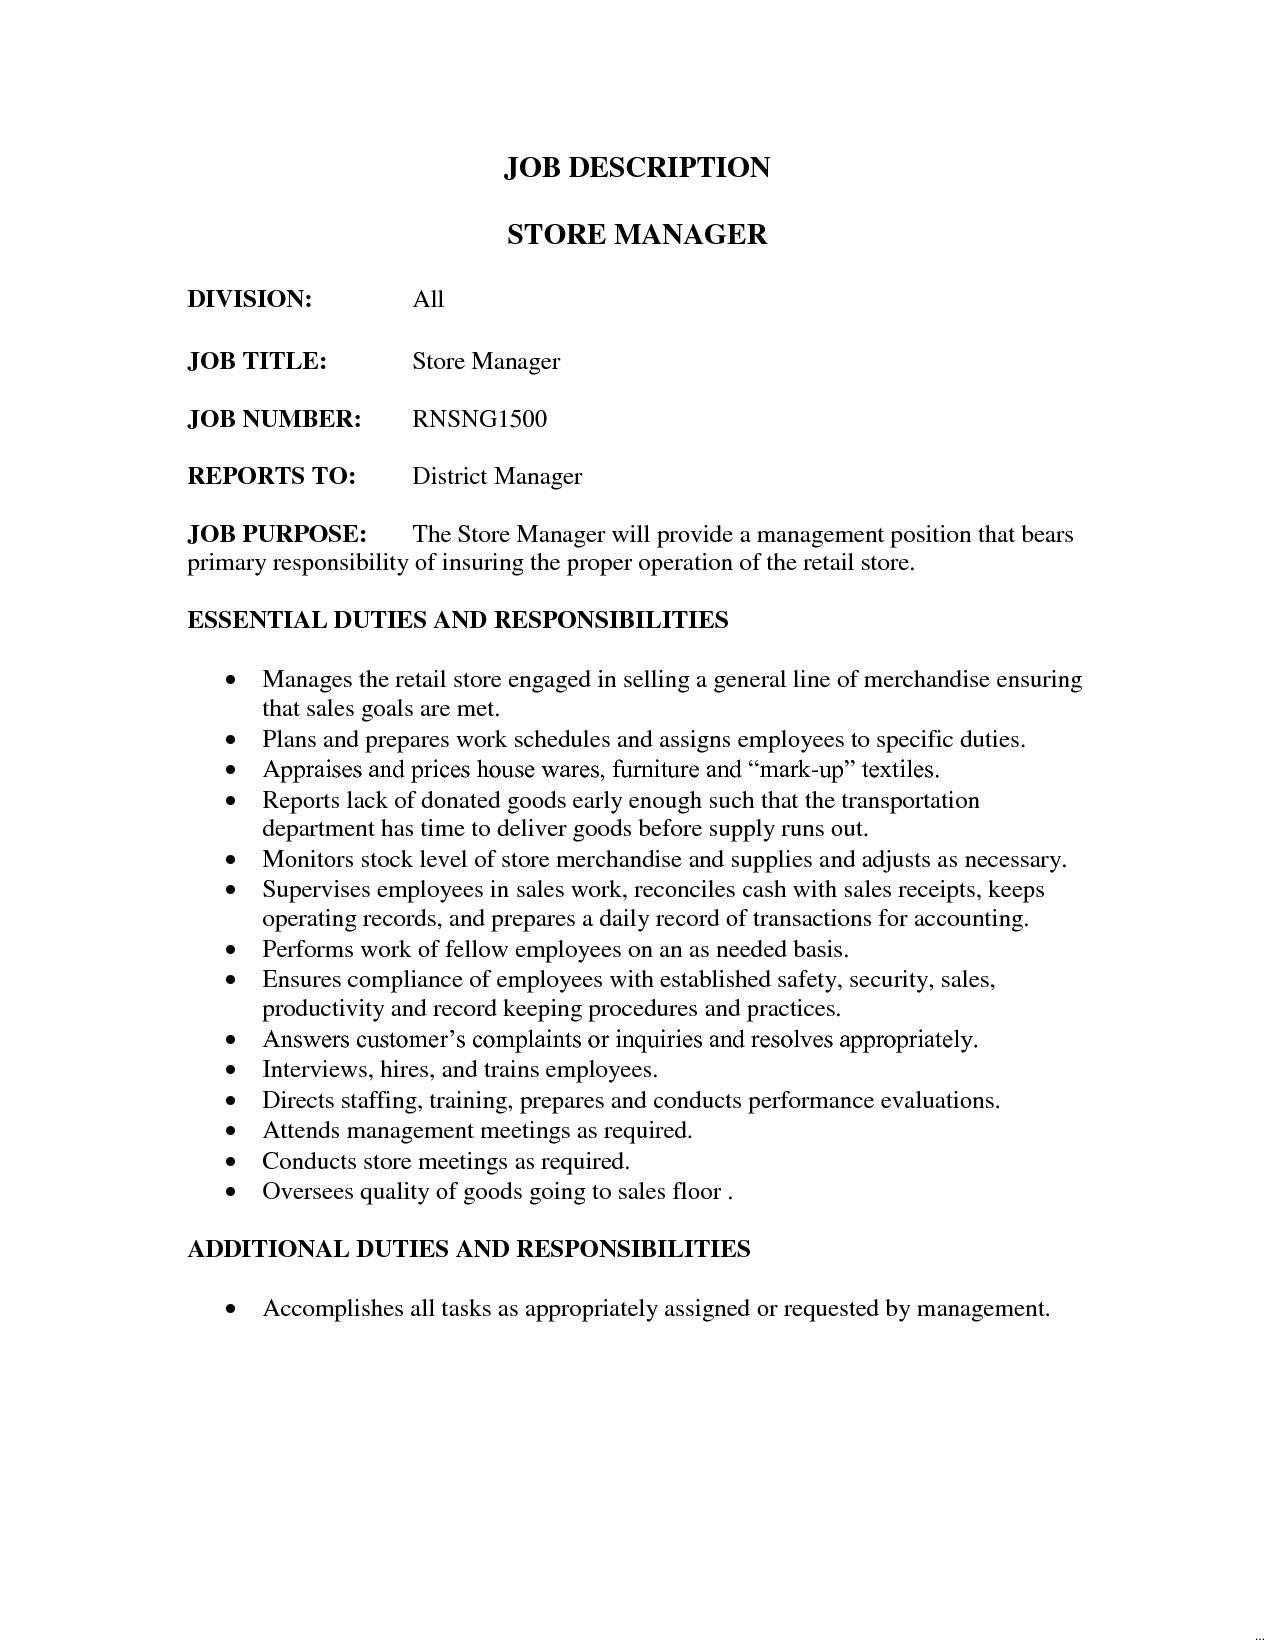 Retail job description revolutionary store manager sales resume ...